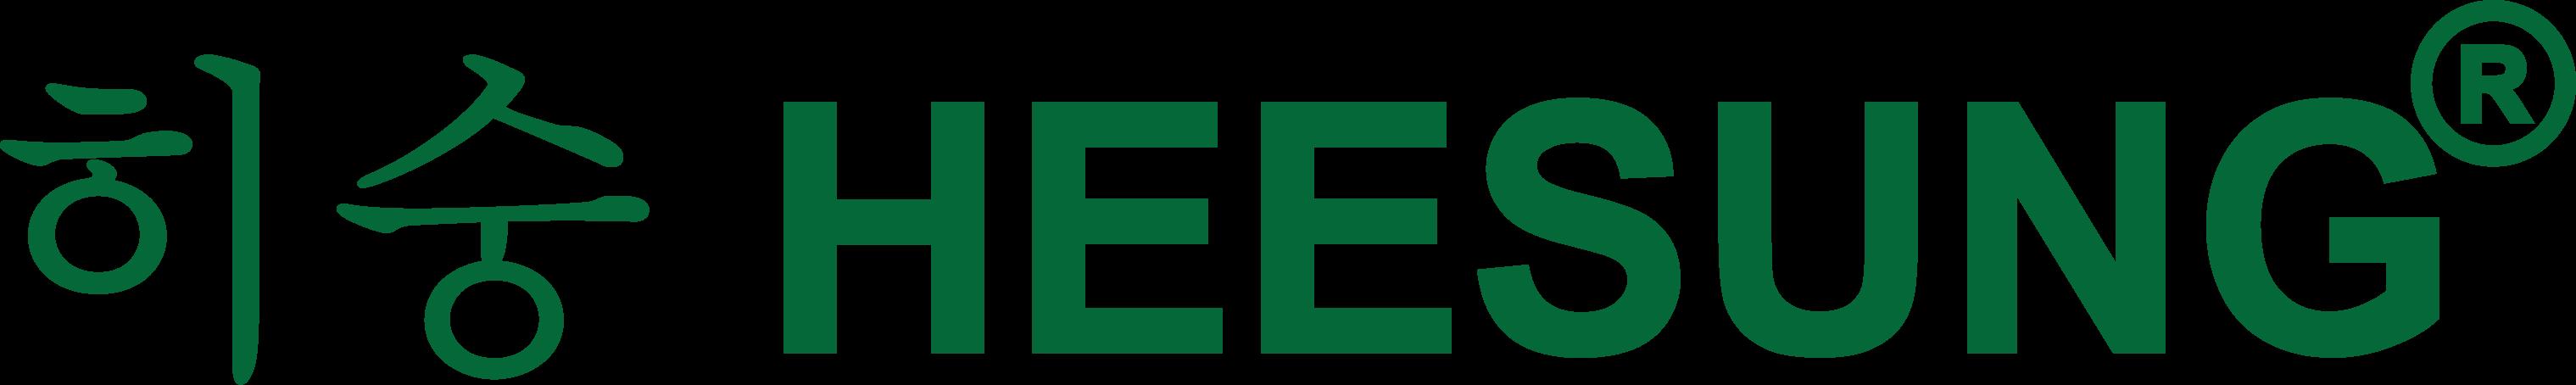 logo-heesung